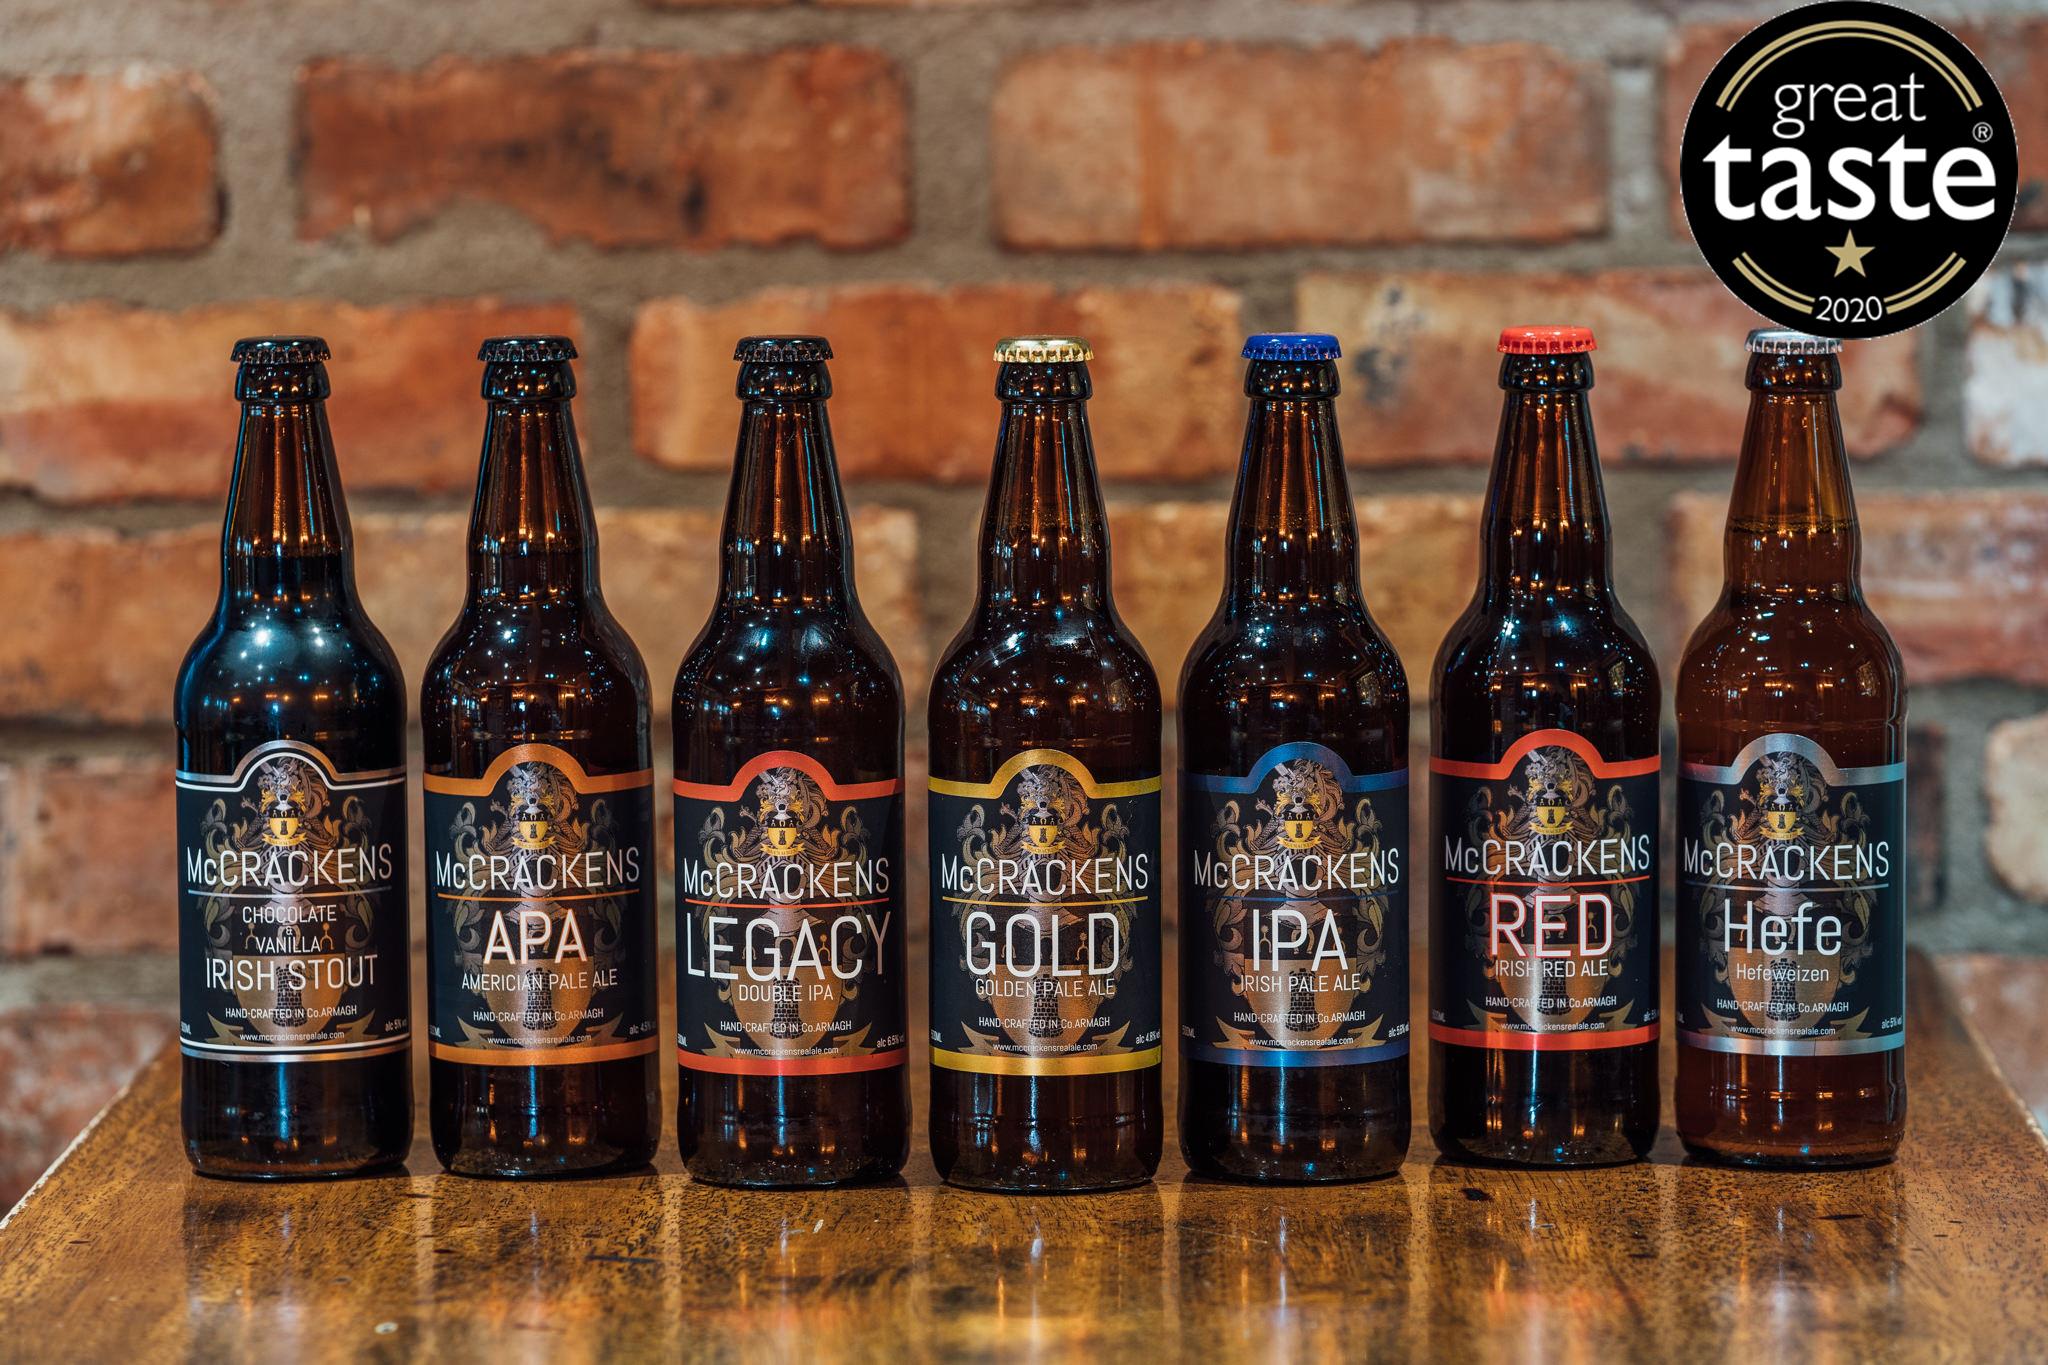 Award winning beers